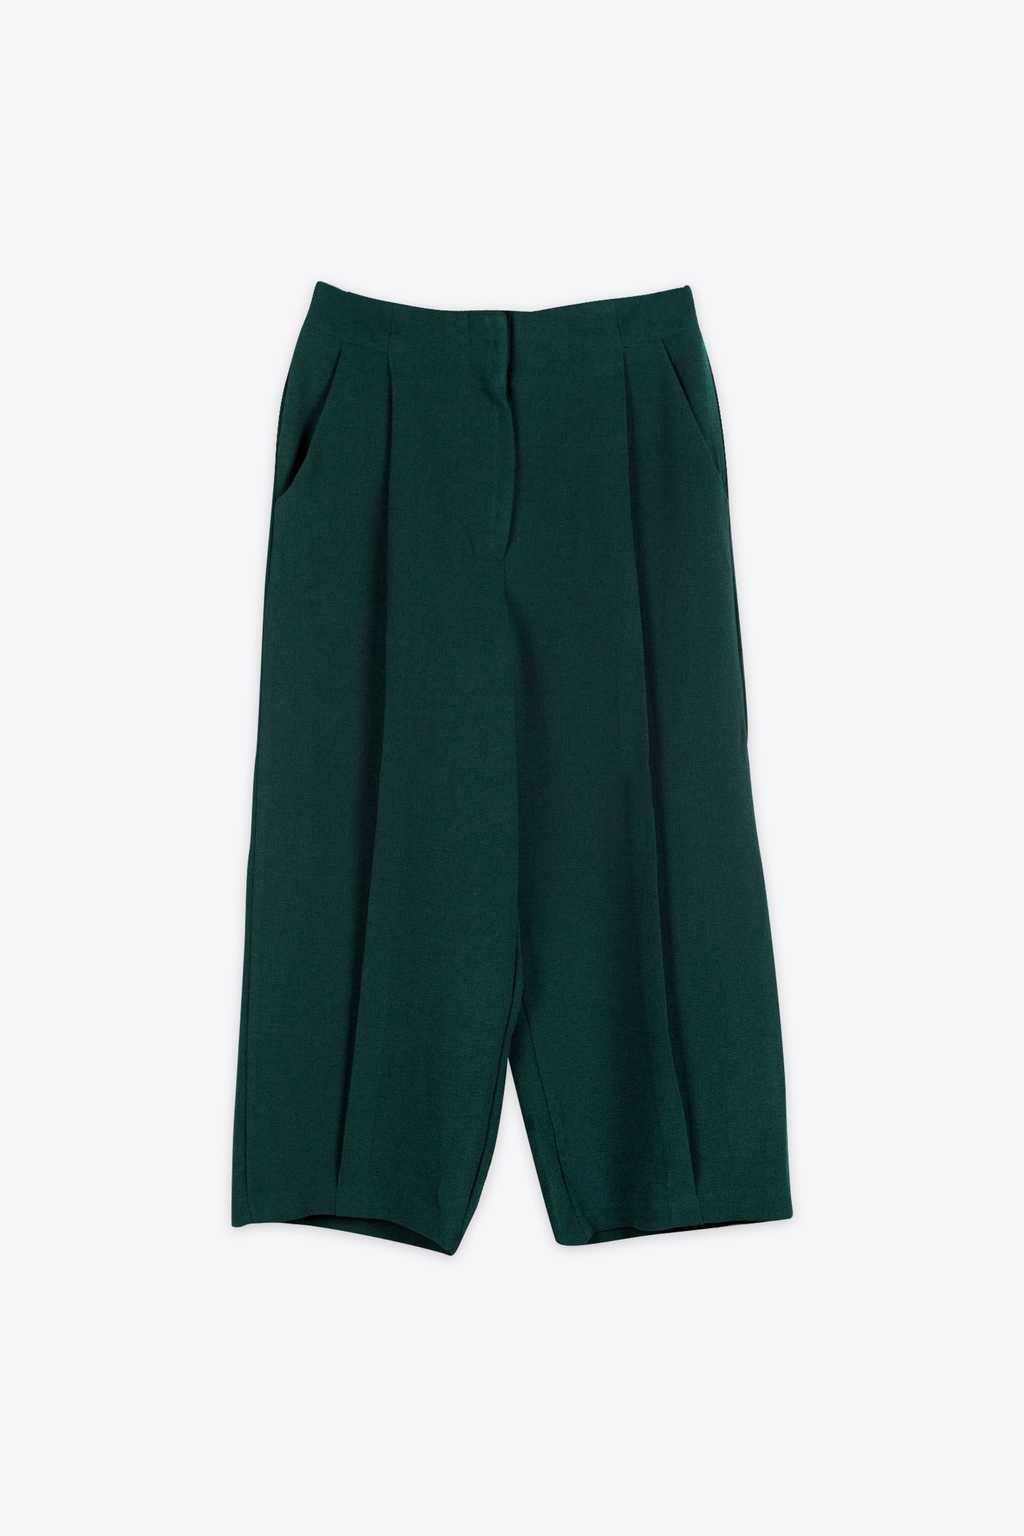 Pant H195 Green 9